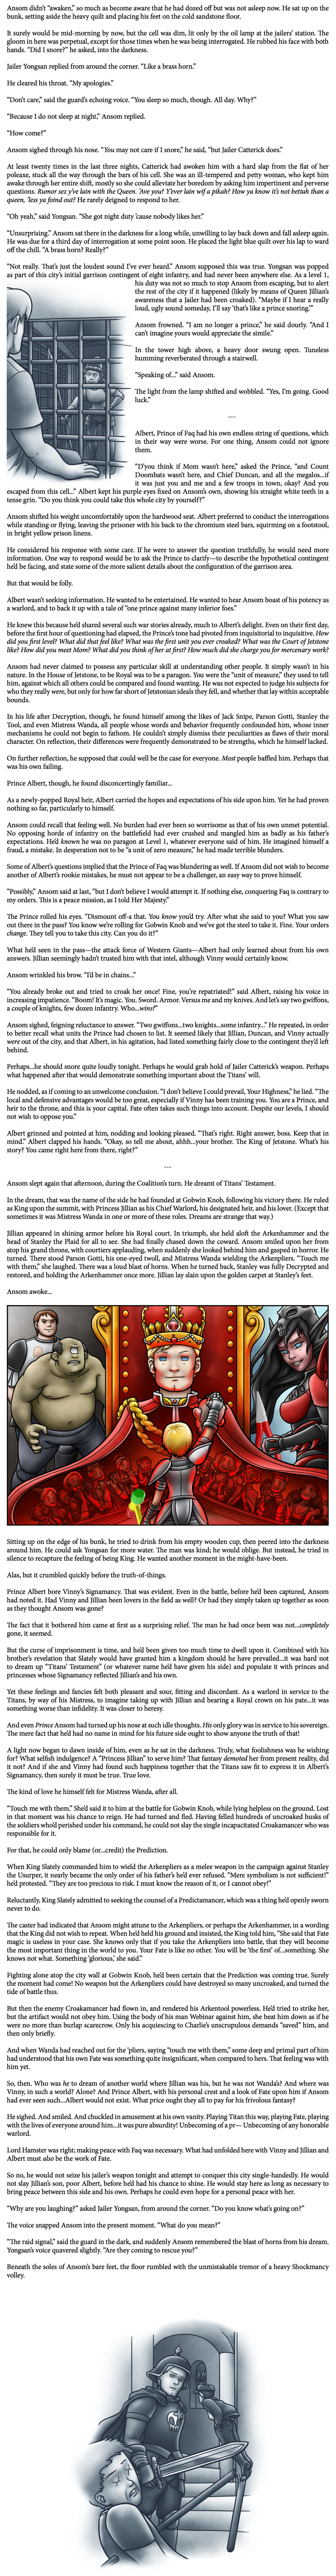 Comic - Book 4 - Page 86